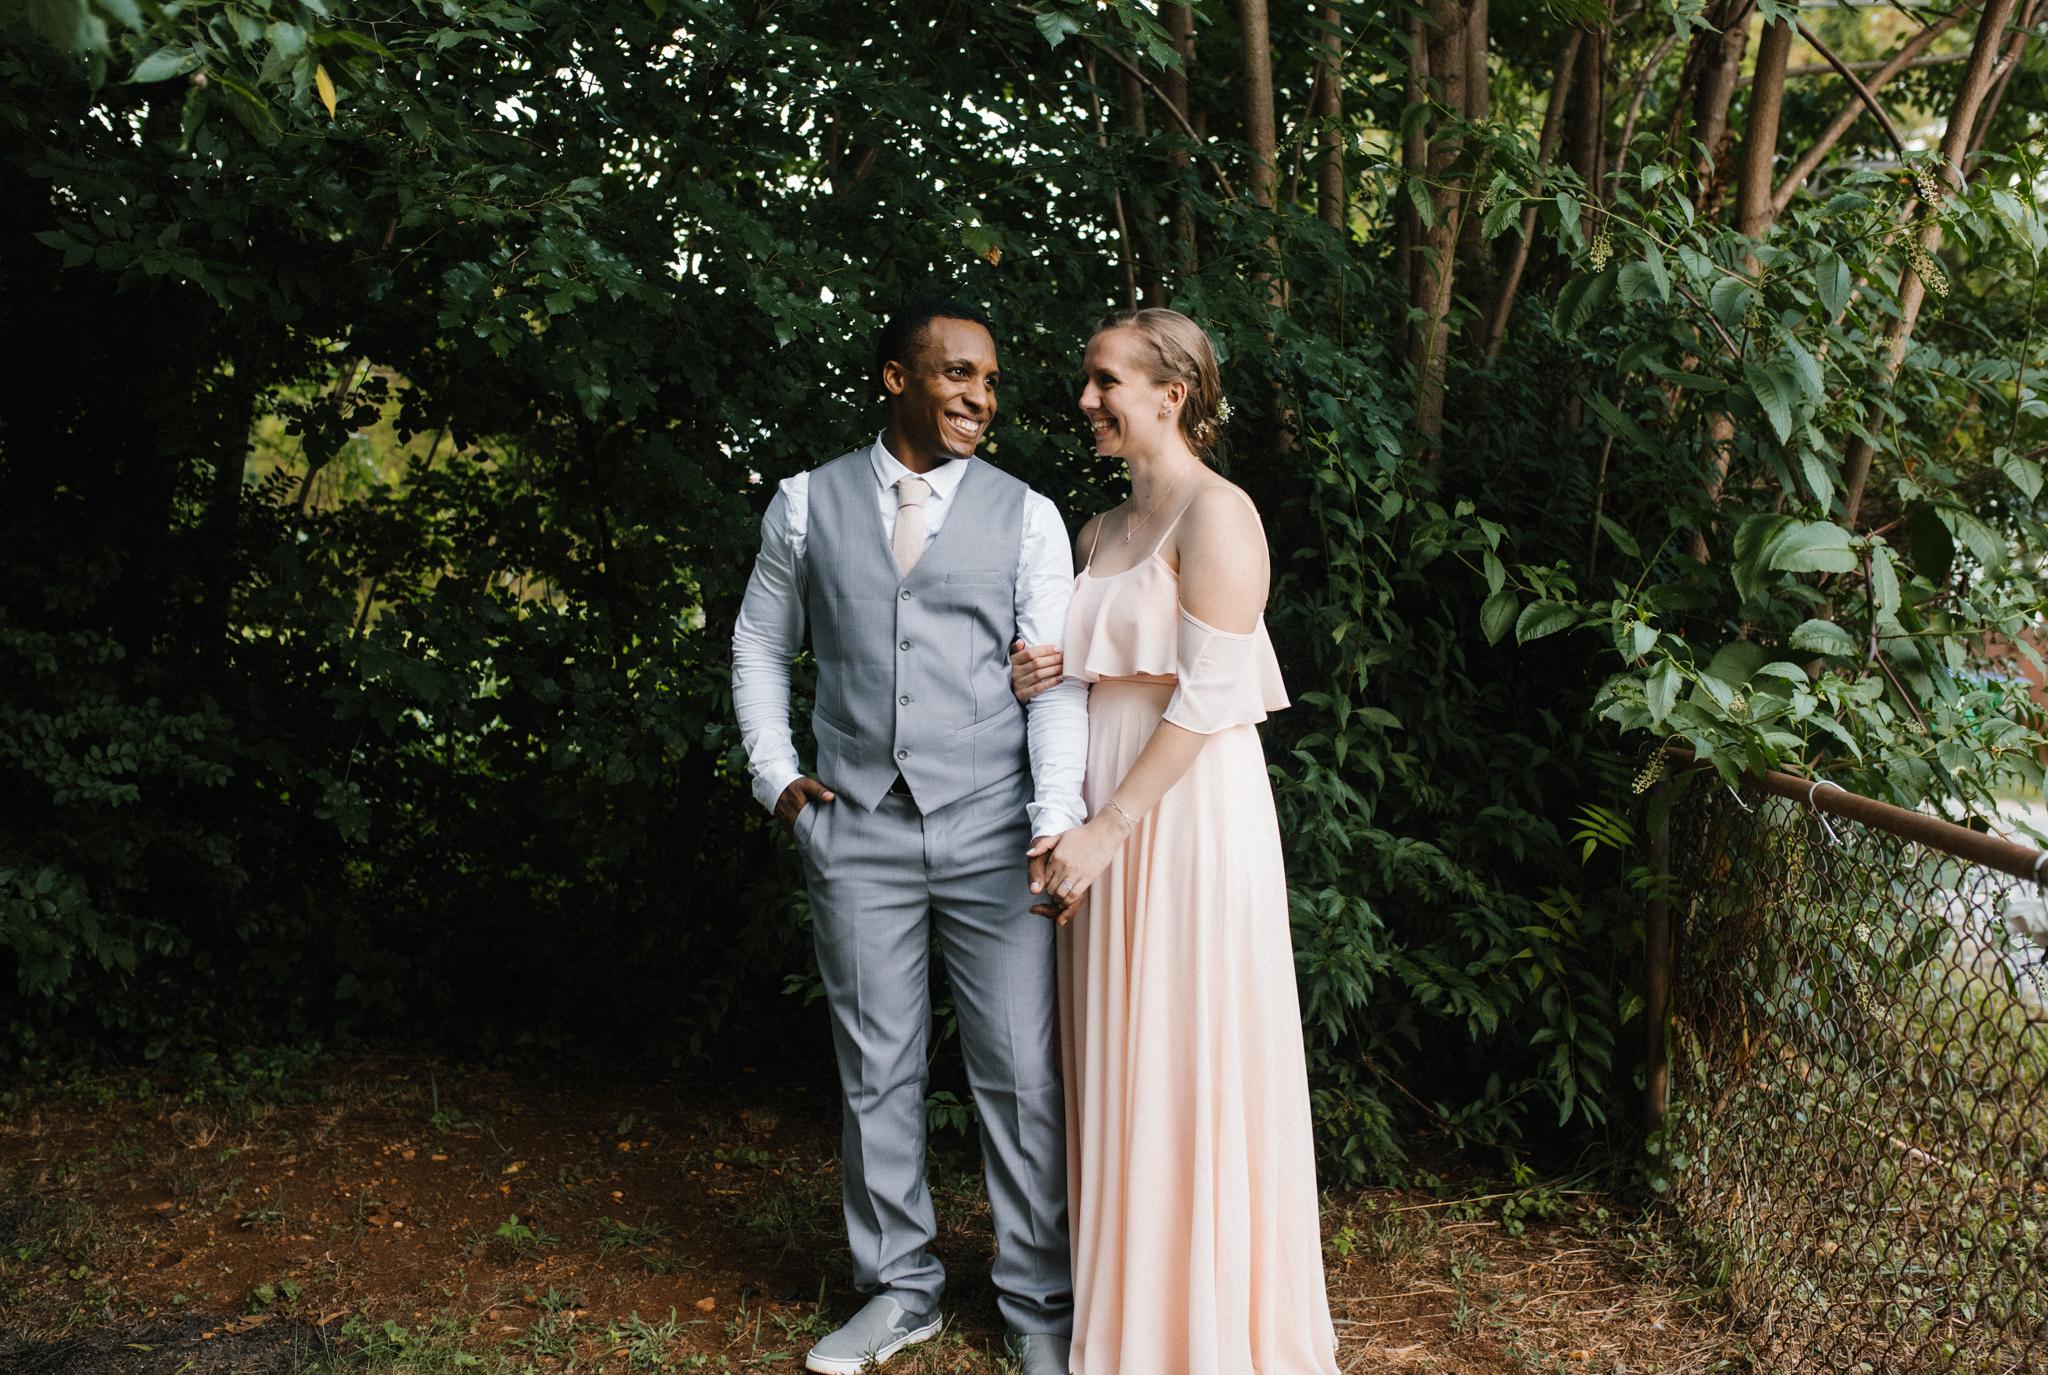 dorota_dwight_richmond_backyard_wedding-71.jpg